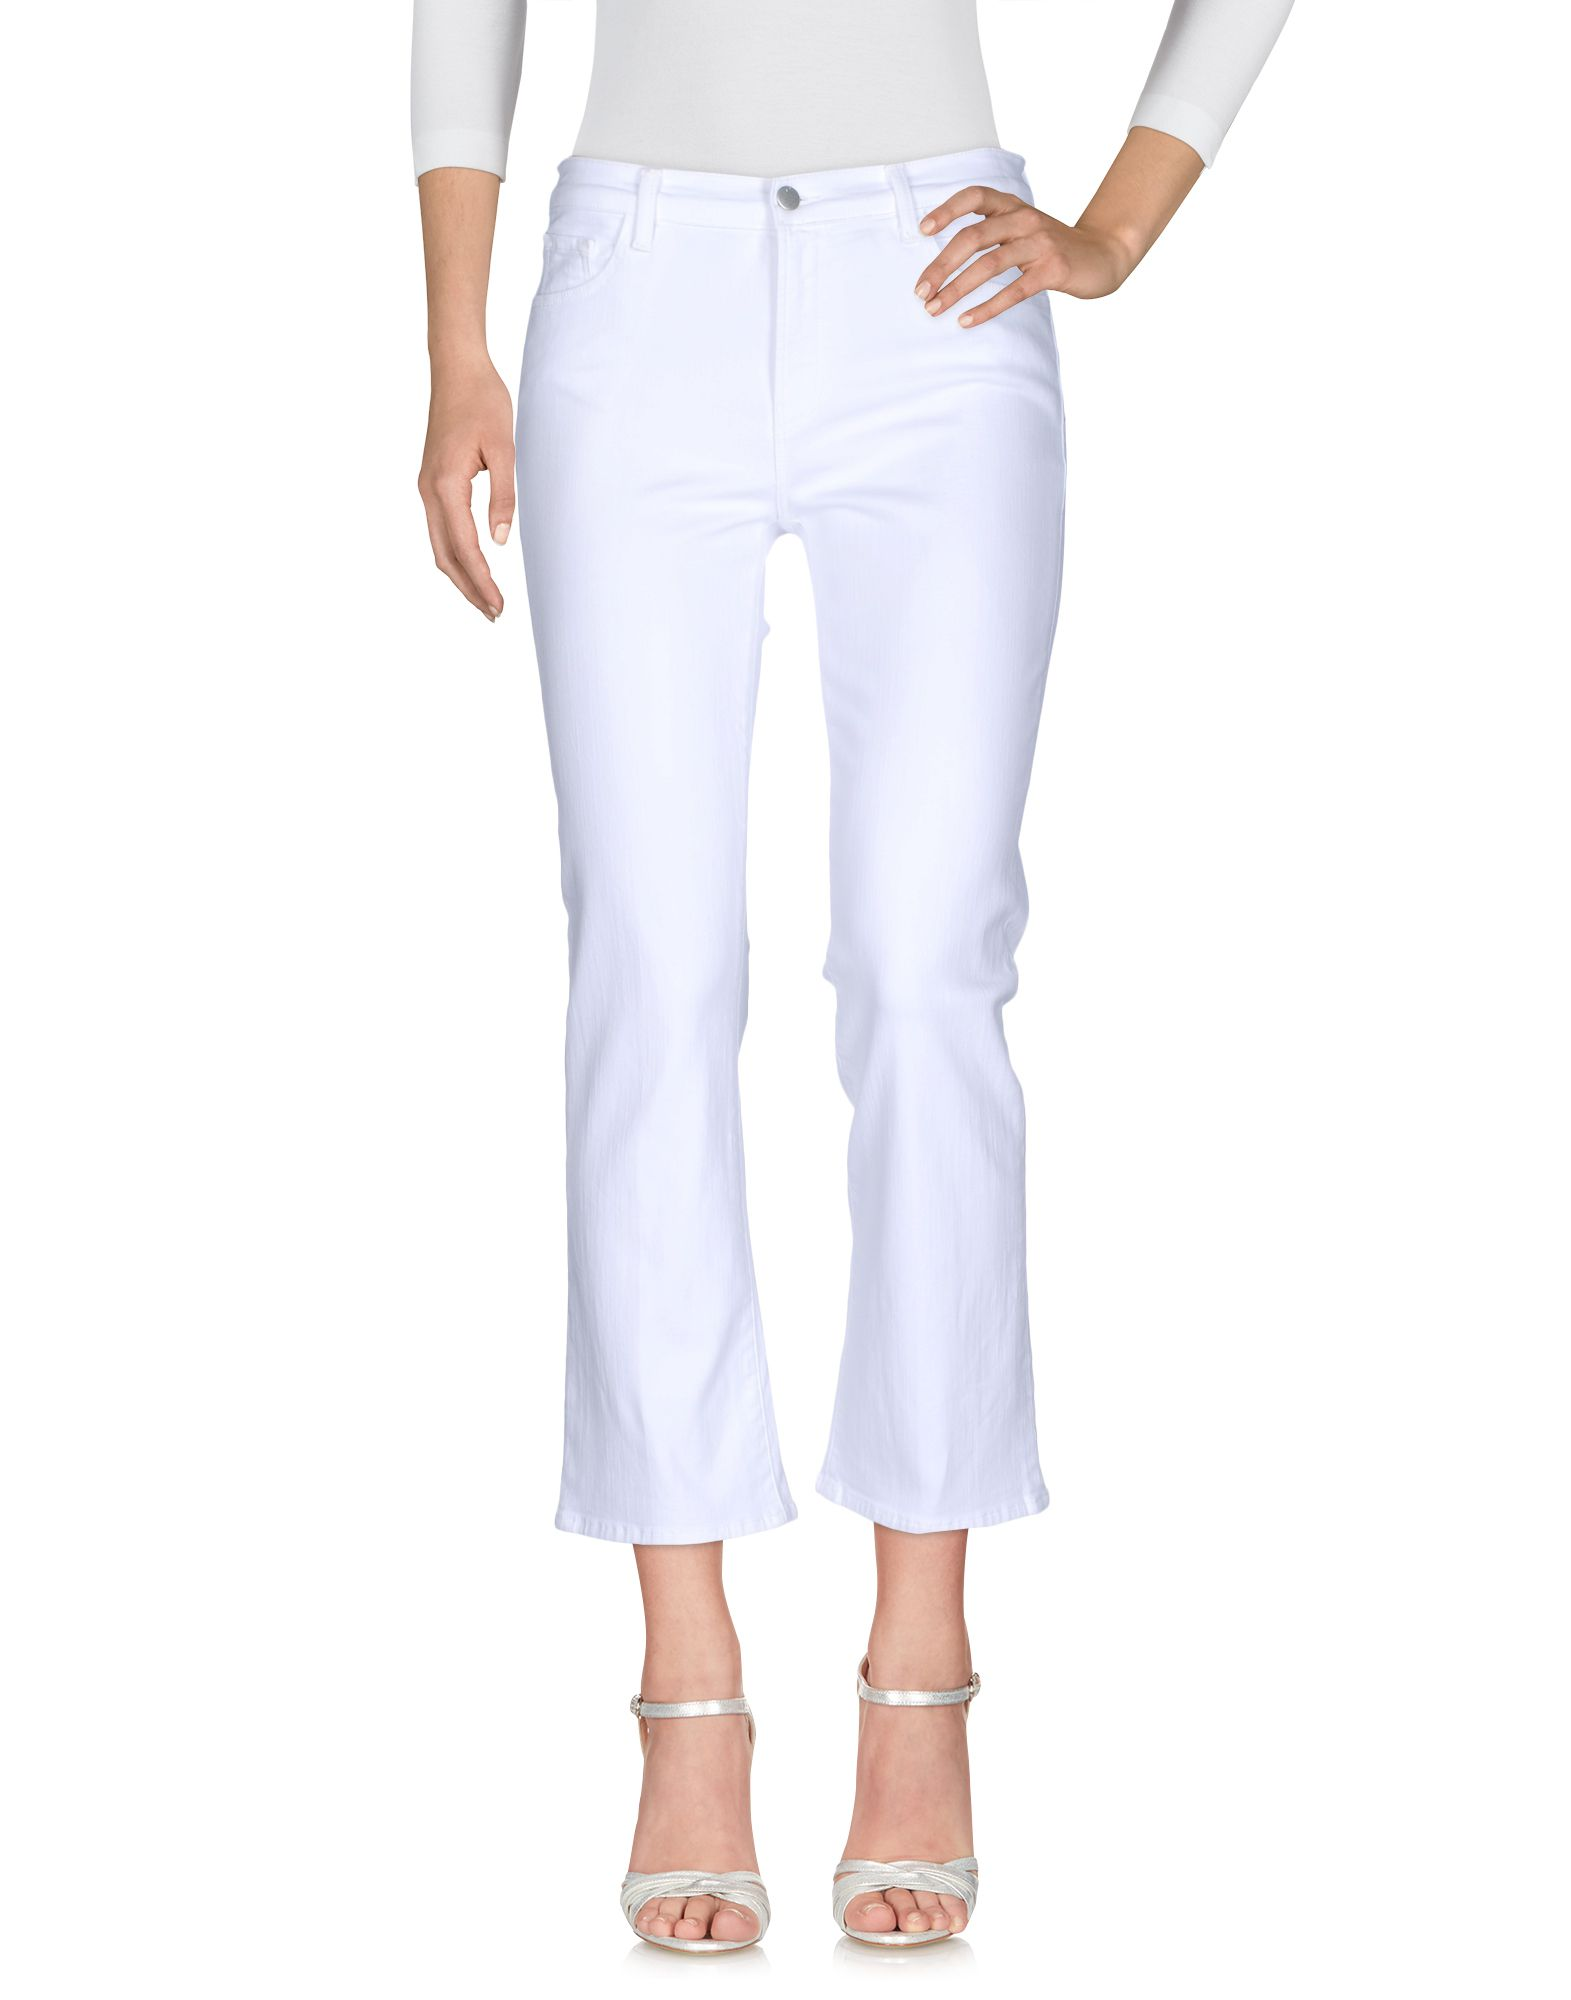 Pantaloni Jeans J Brand Donna - Acquista online su ZcBqVKfwQ